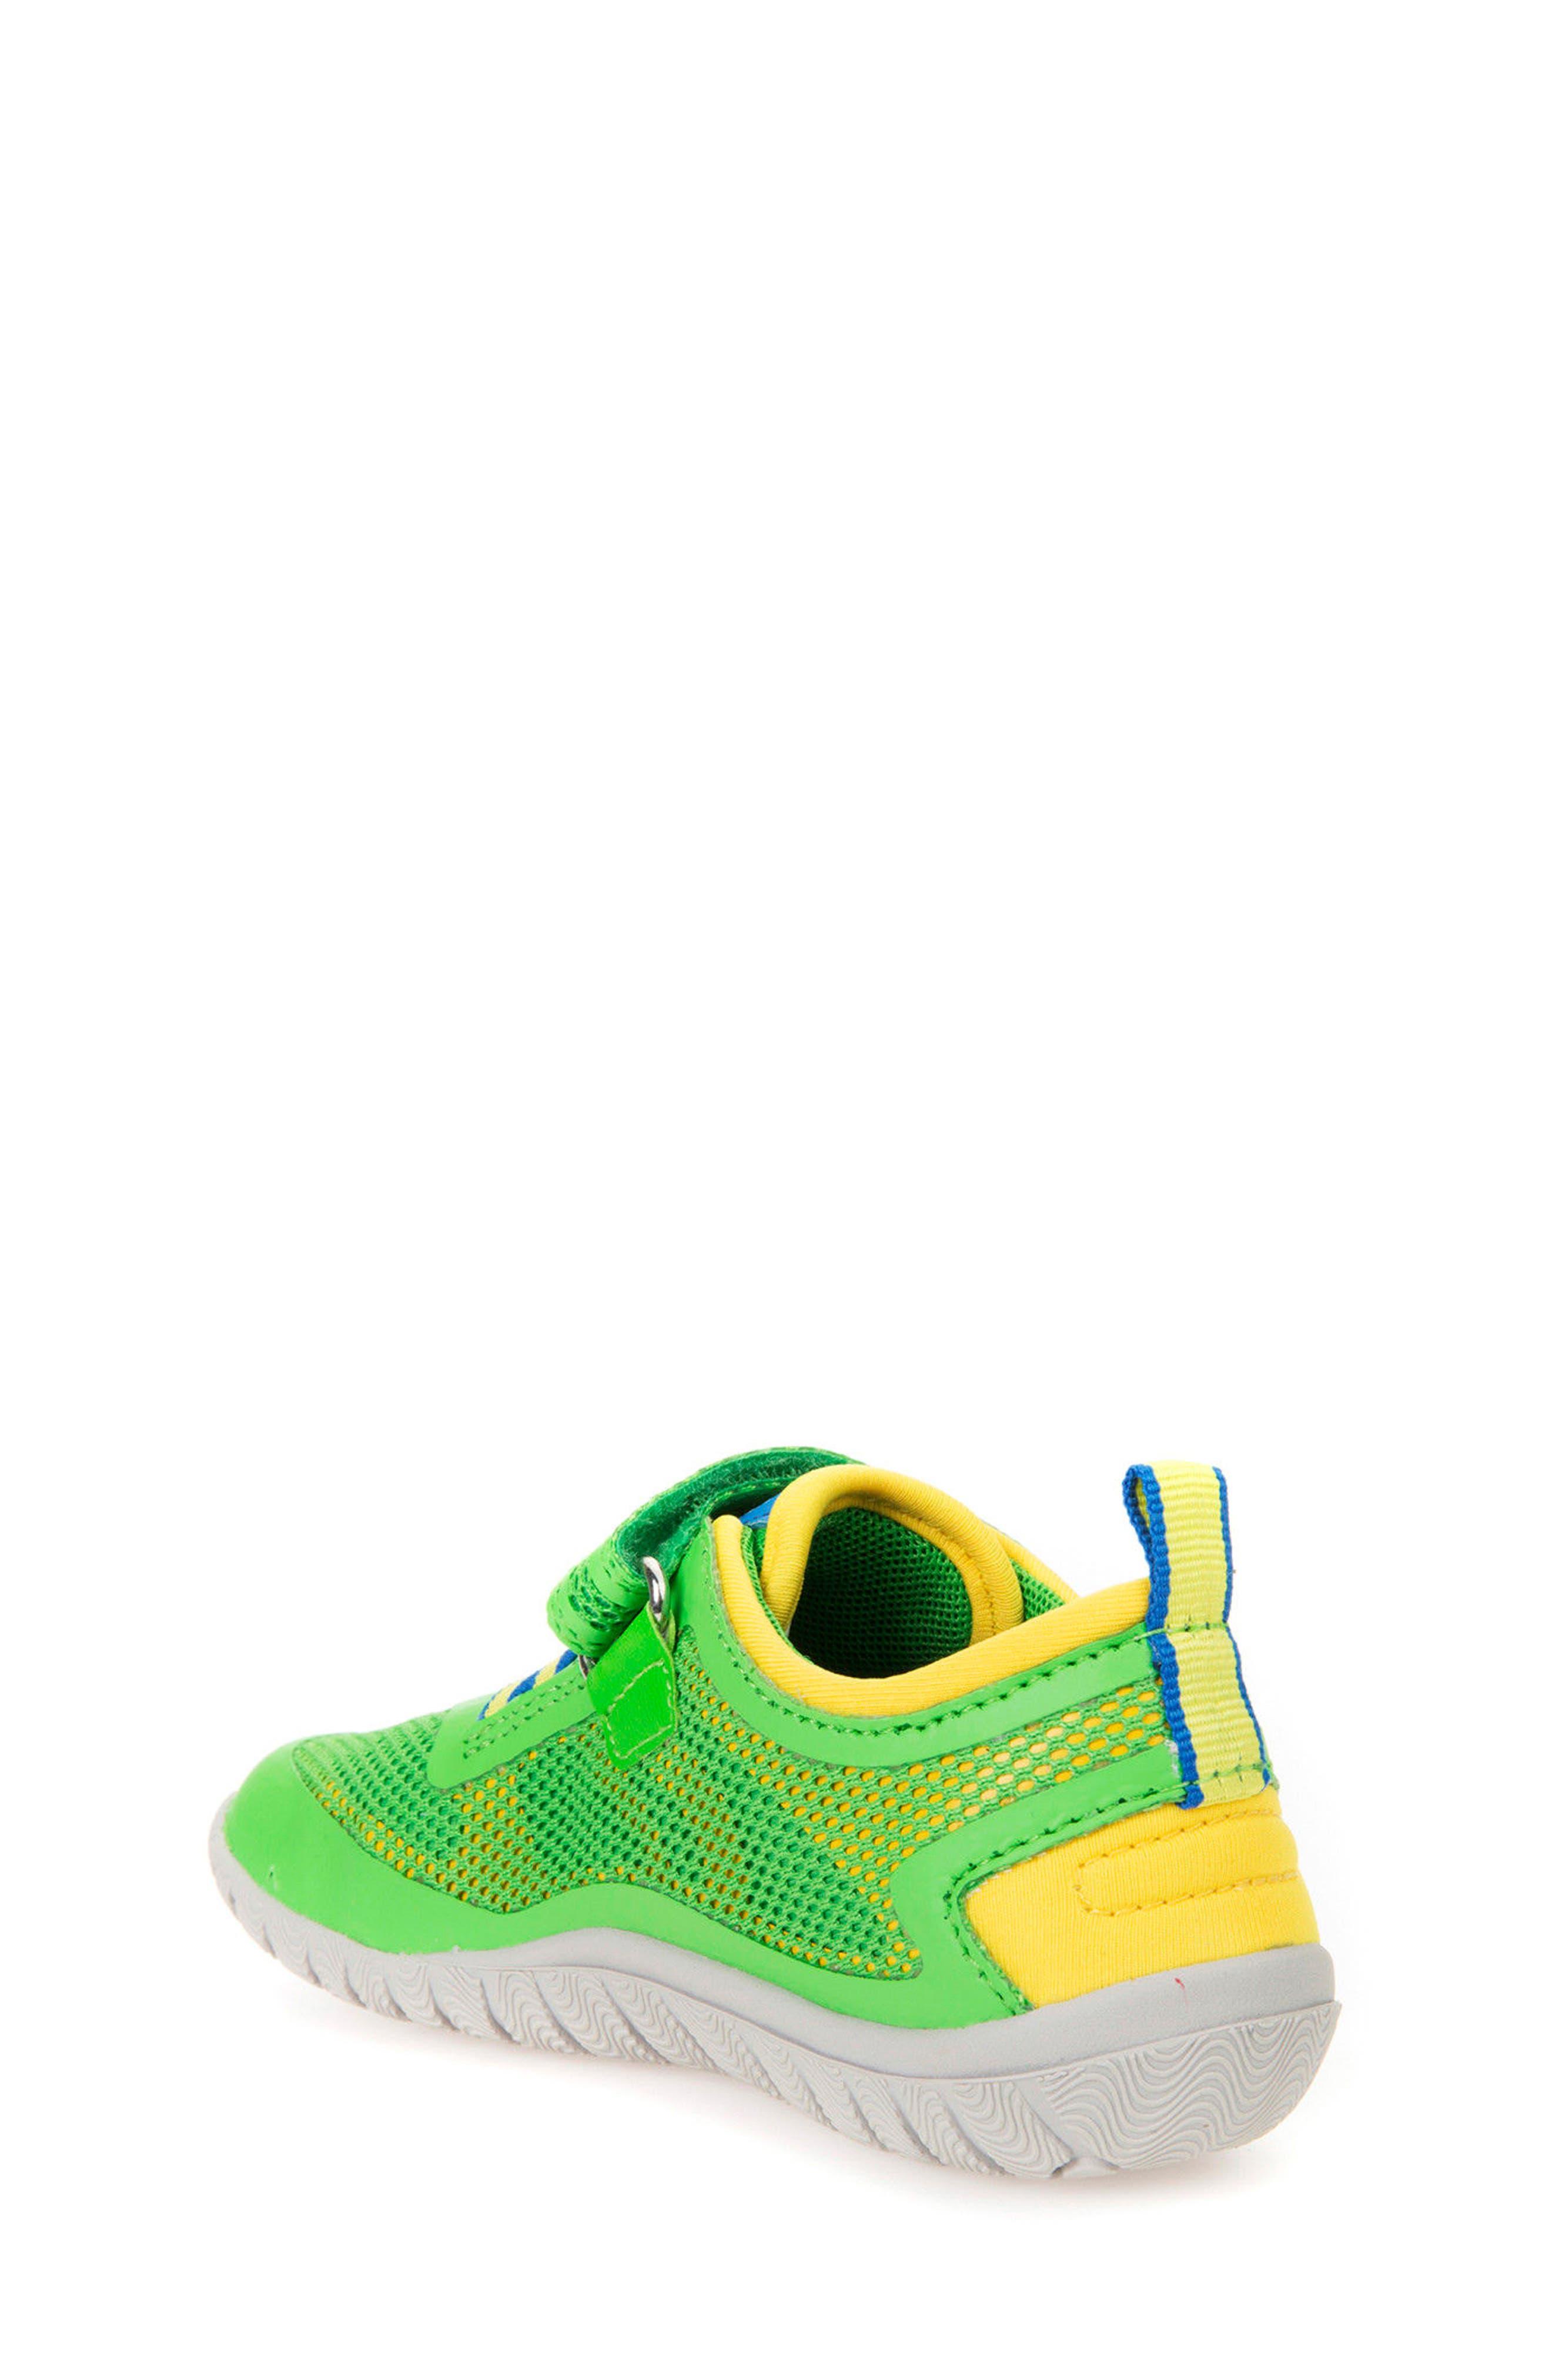 Trifon Sneaker,                             Alternate thumbnail 2, color,                             GREEN/ YELLOW